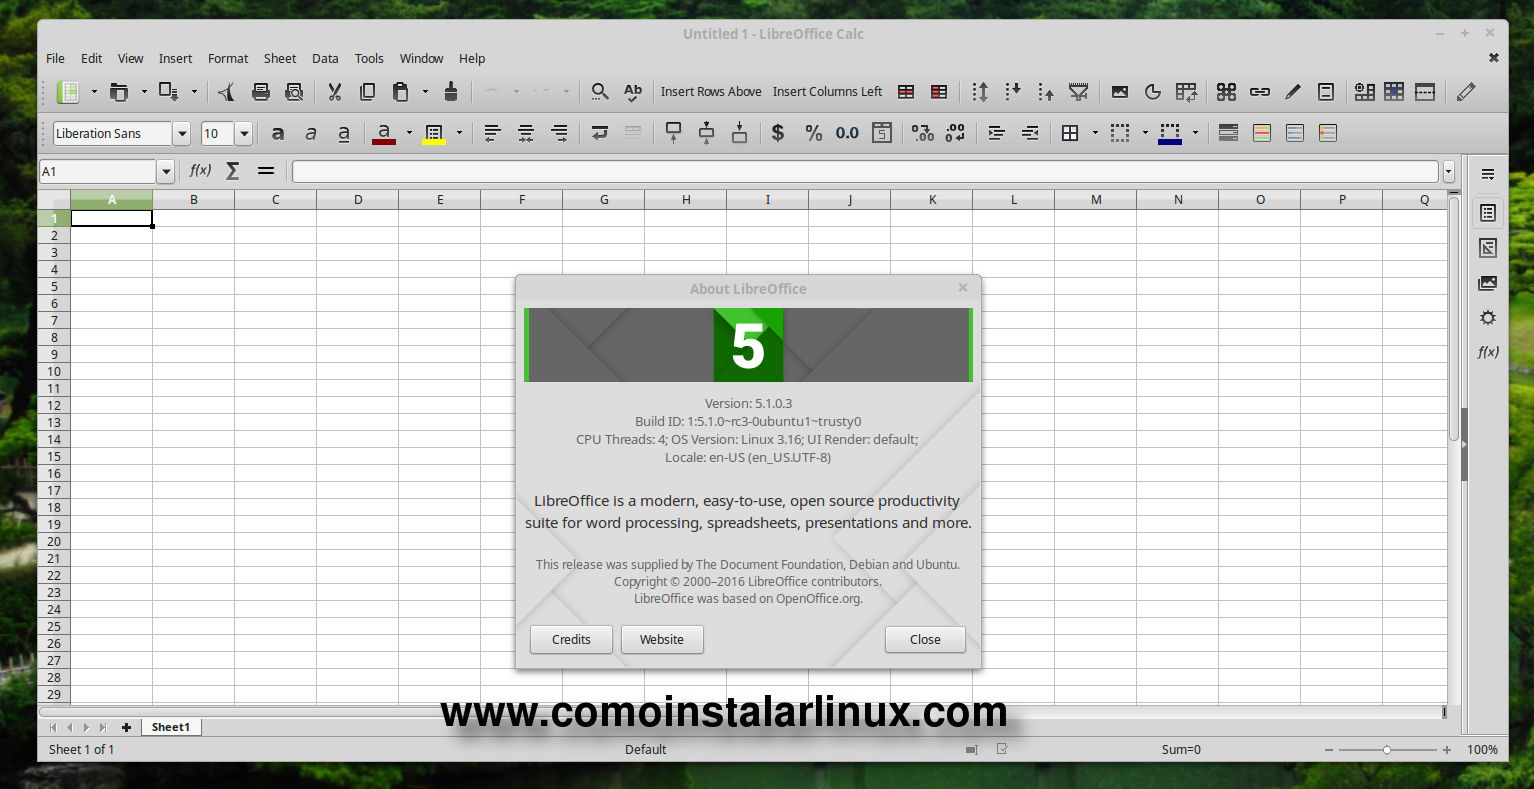 libreofice 5.1 install ubuntu linux mint instalar